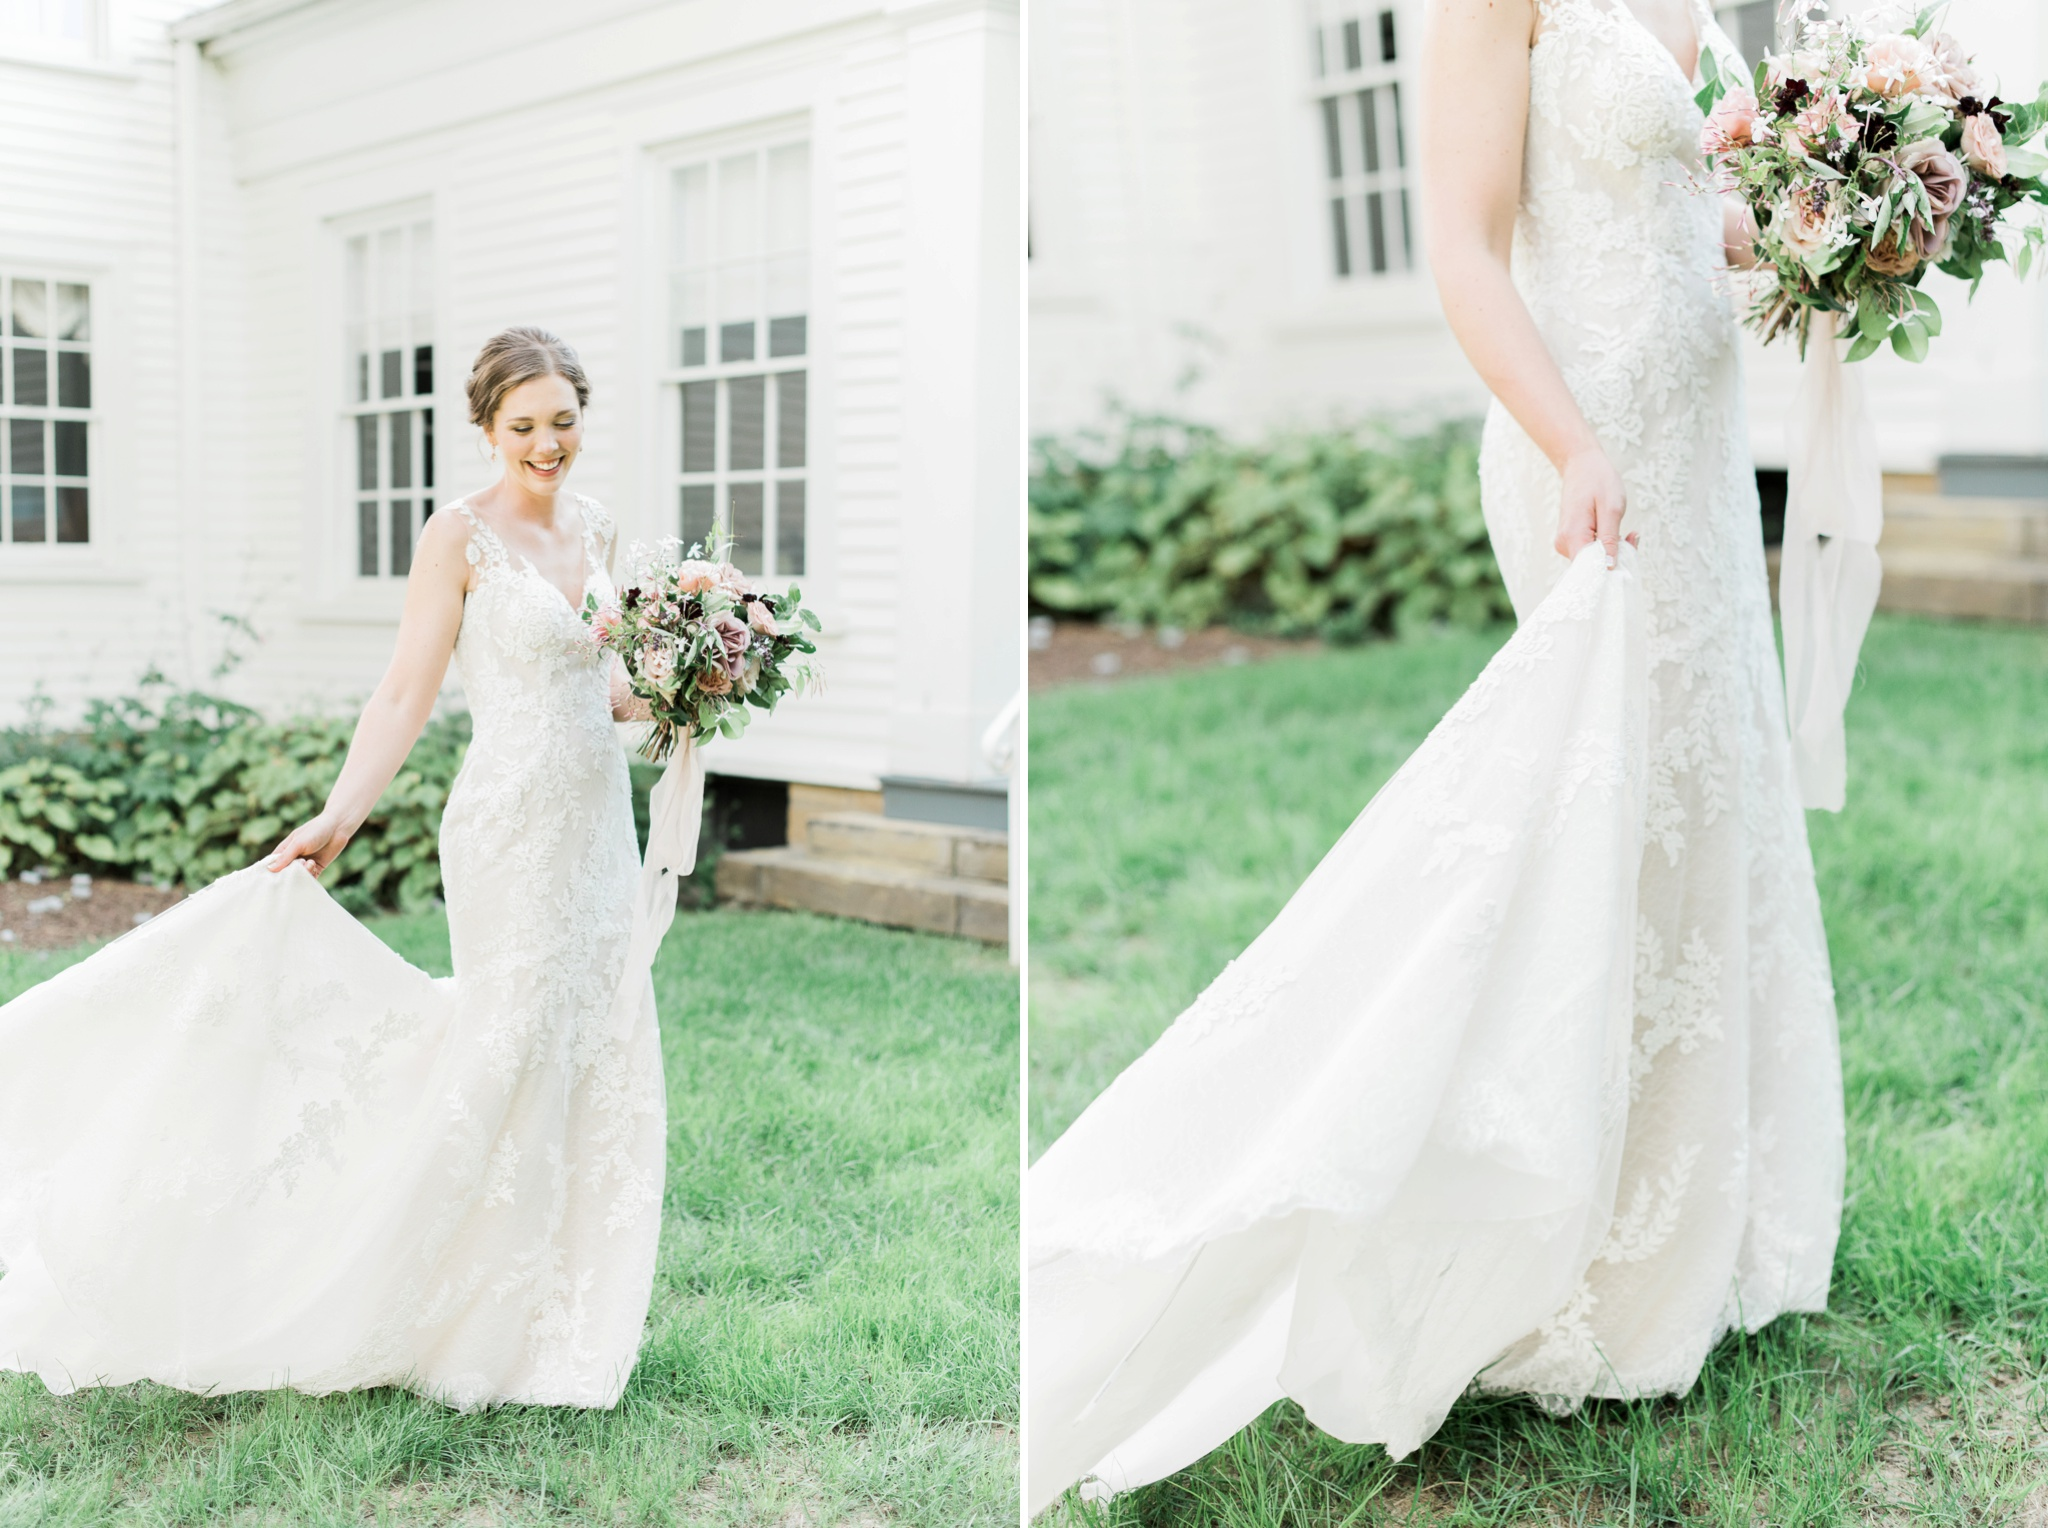 granville-inn-wedding-columbus-ohio-photographer_0076.jpg